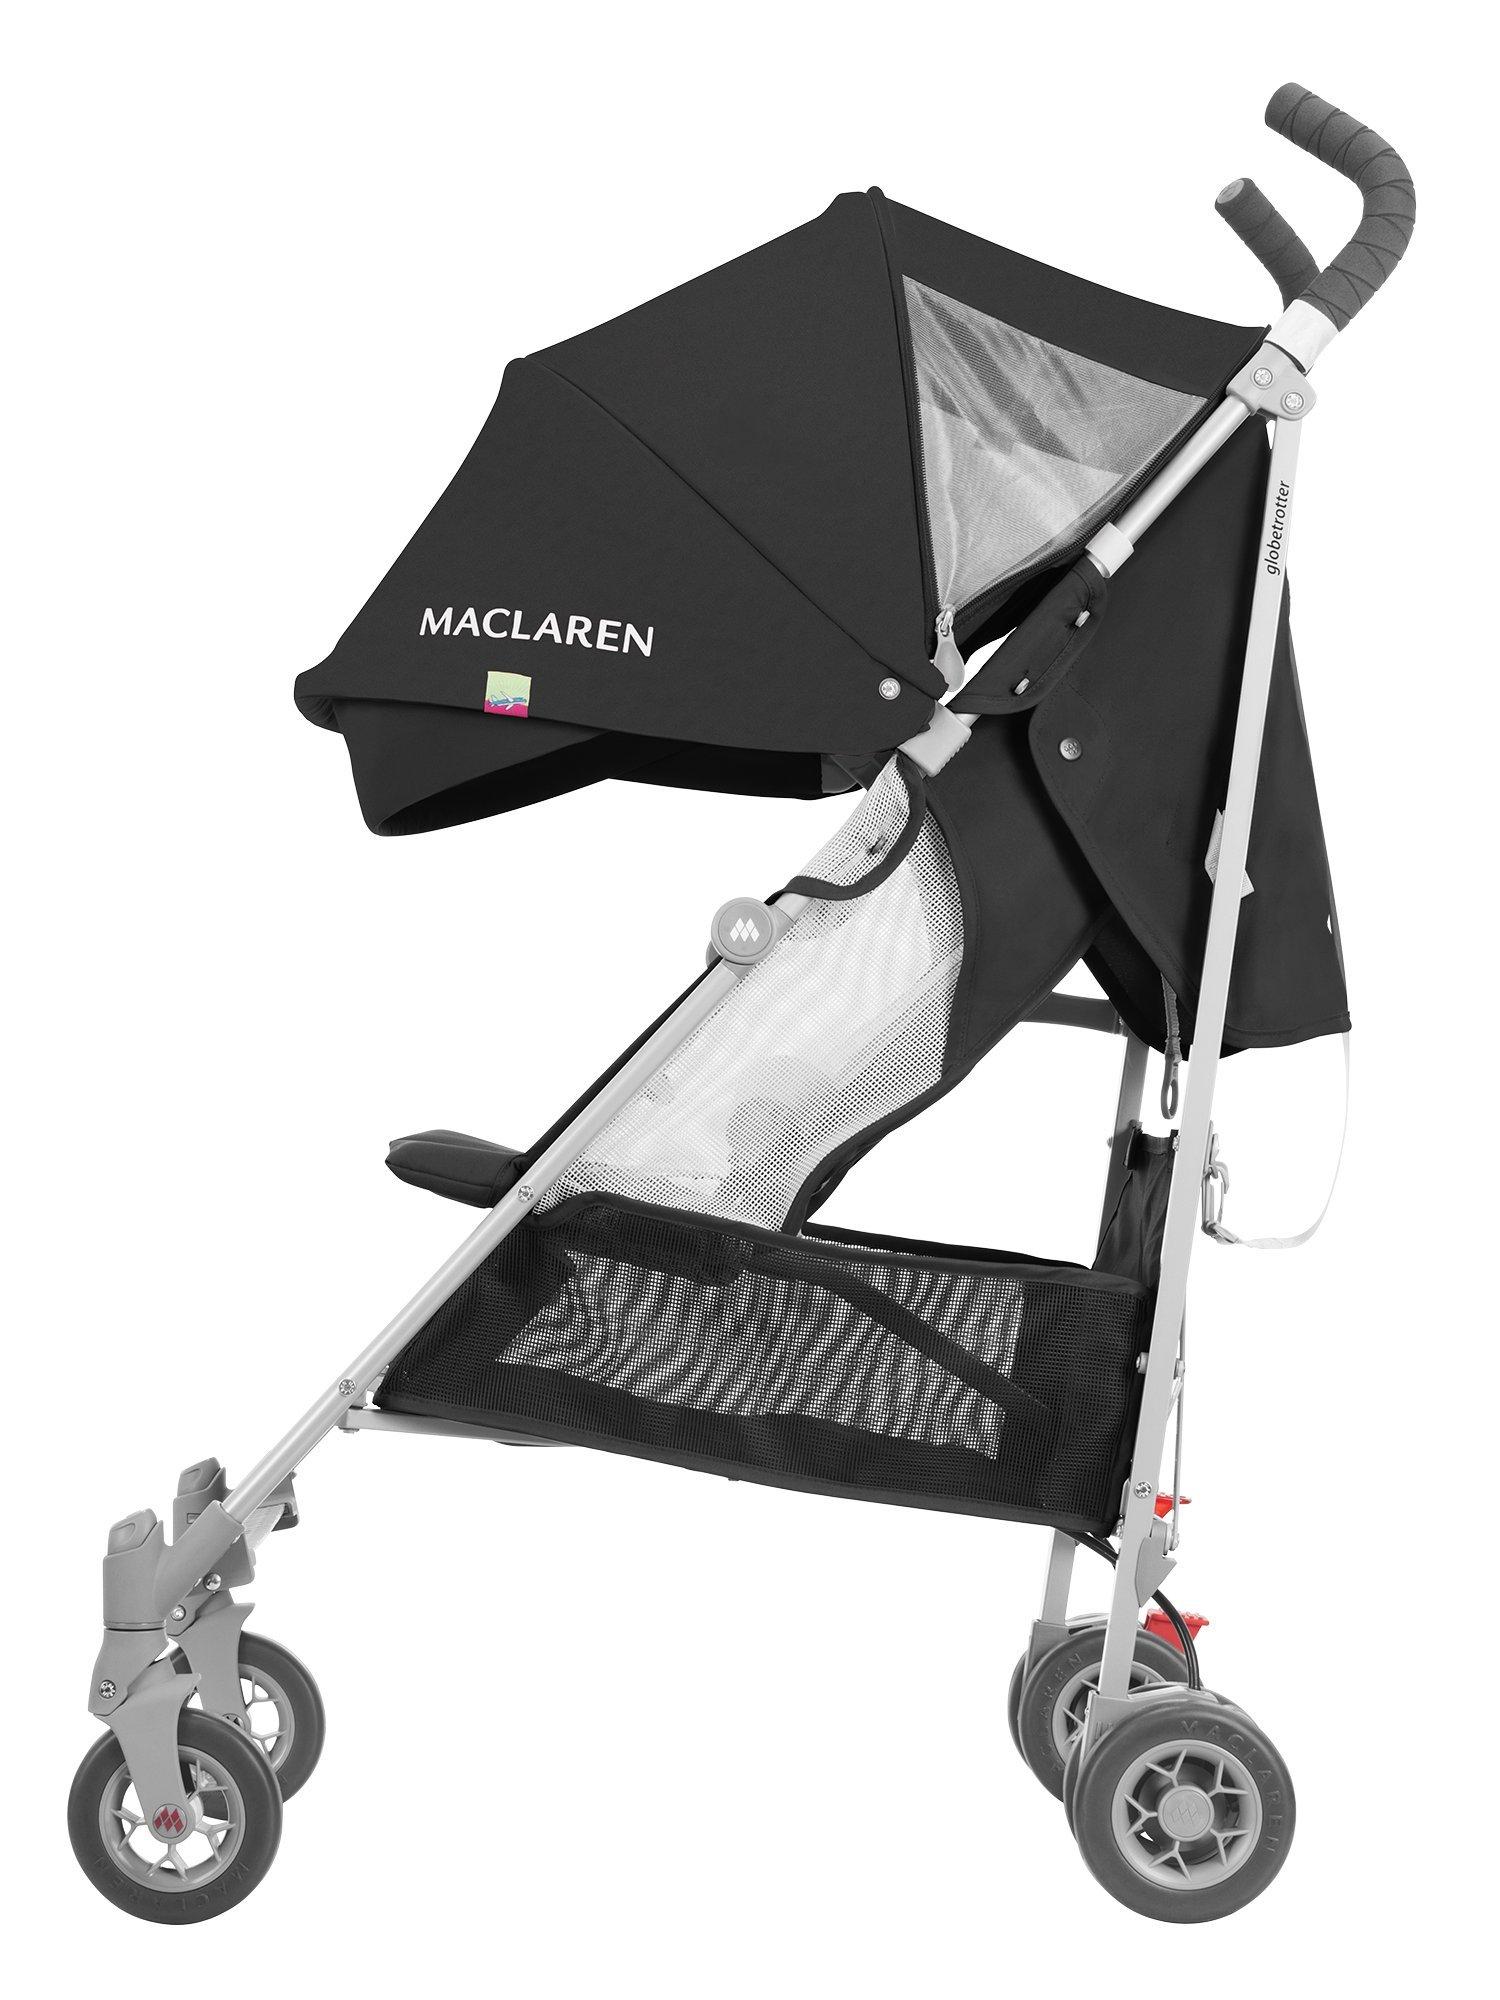 Maclaren Globetrotter Stroller - lightweight, compact by Maclaren (Image #7)